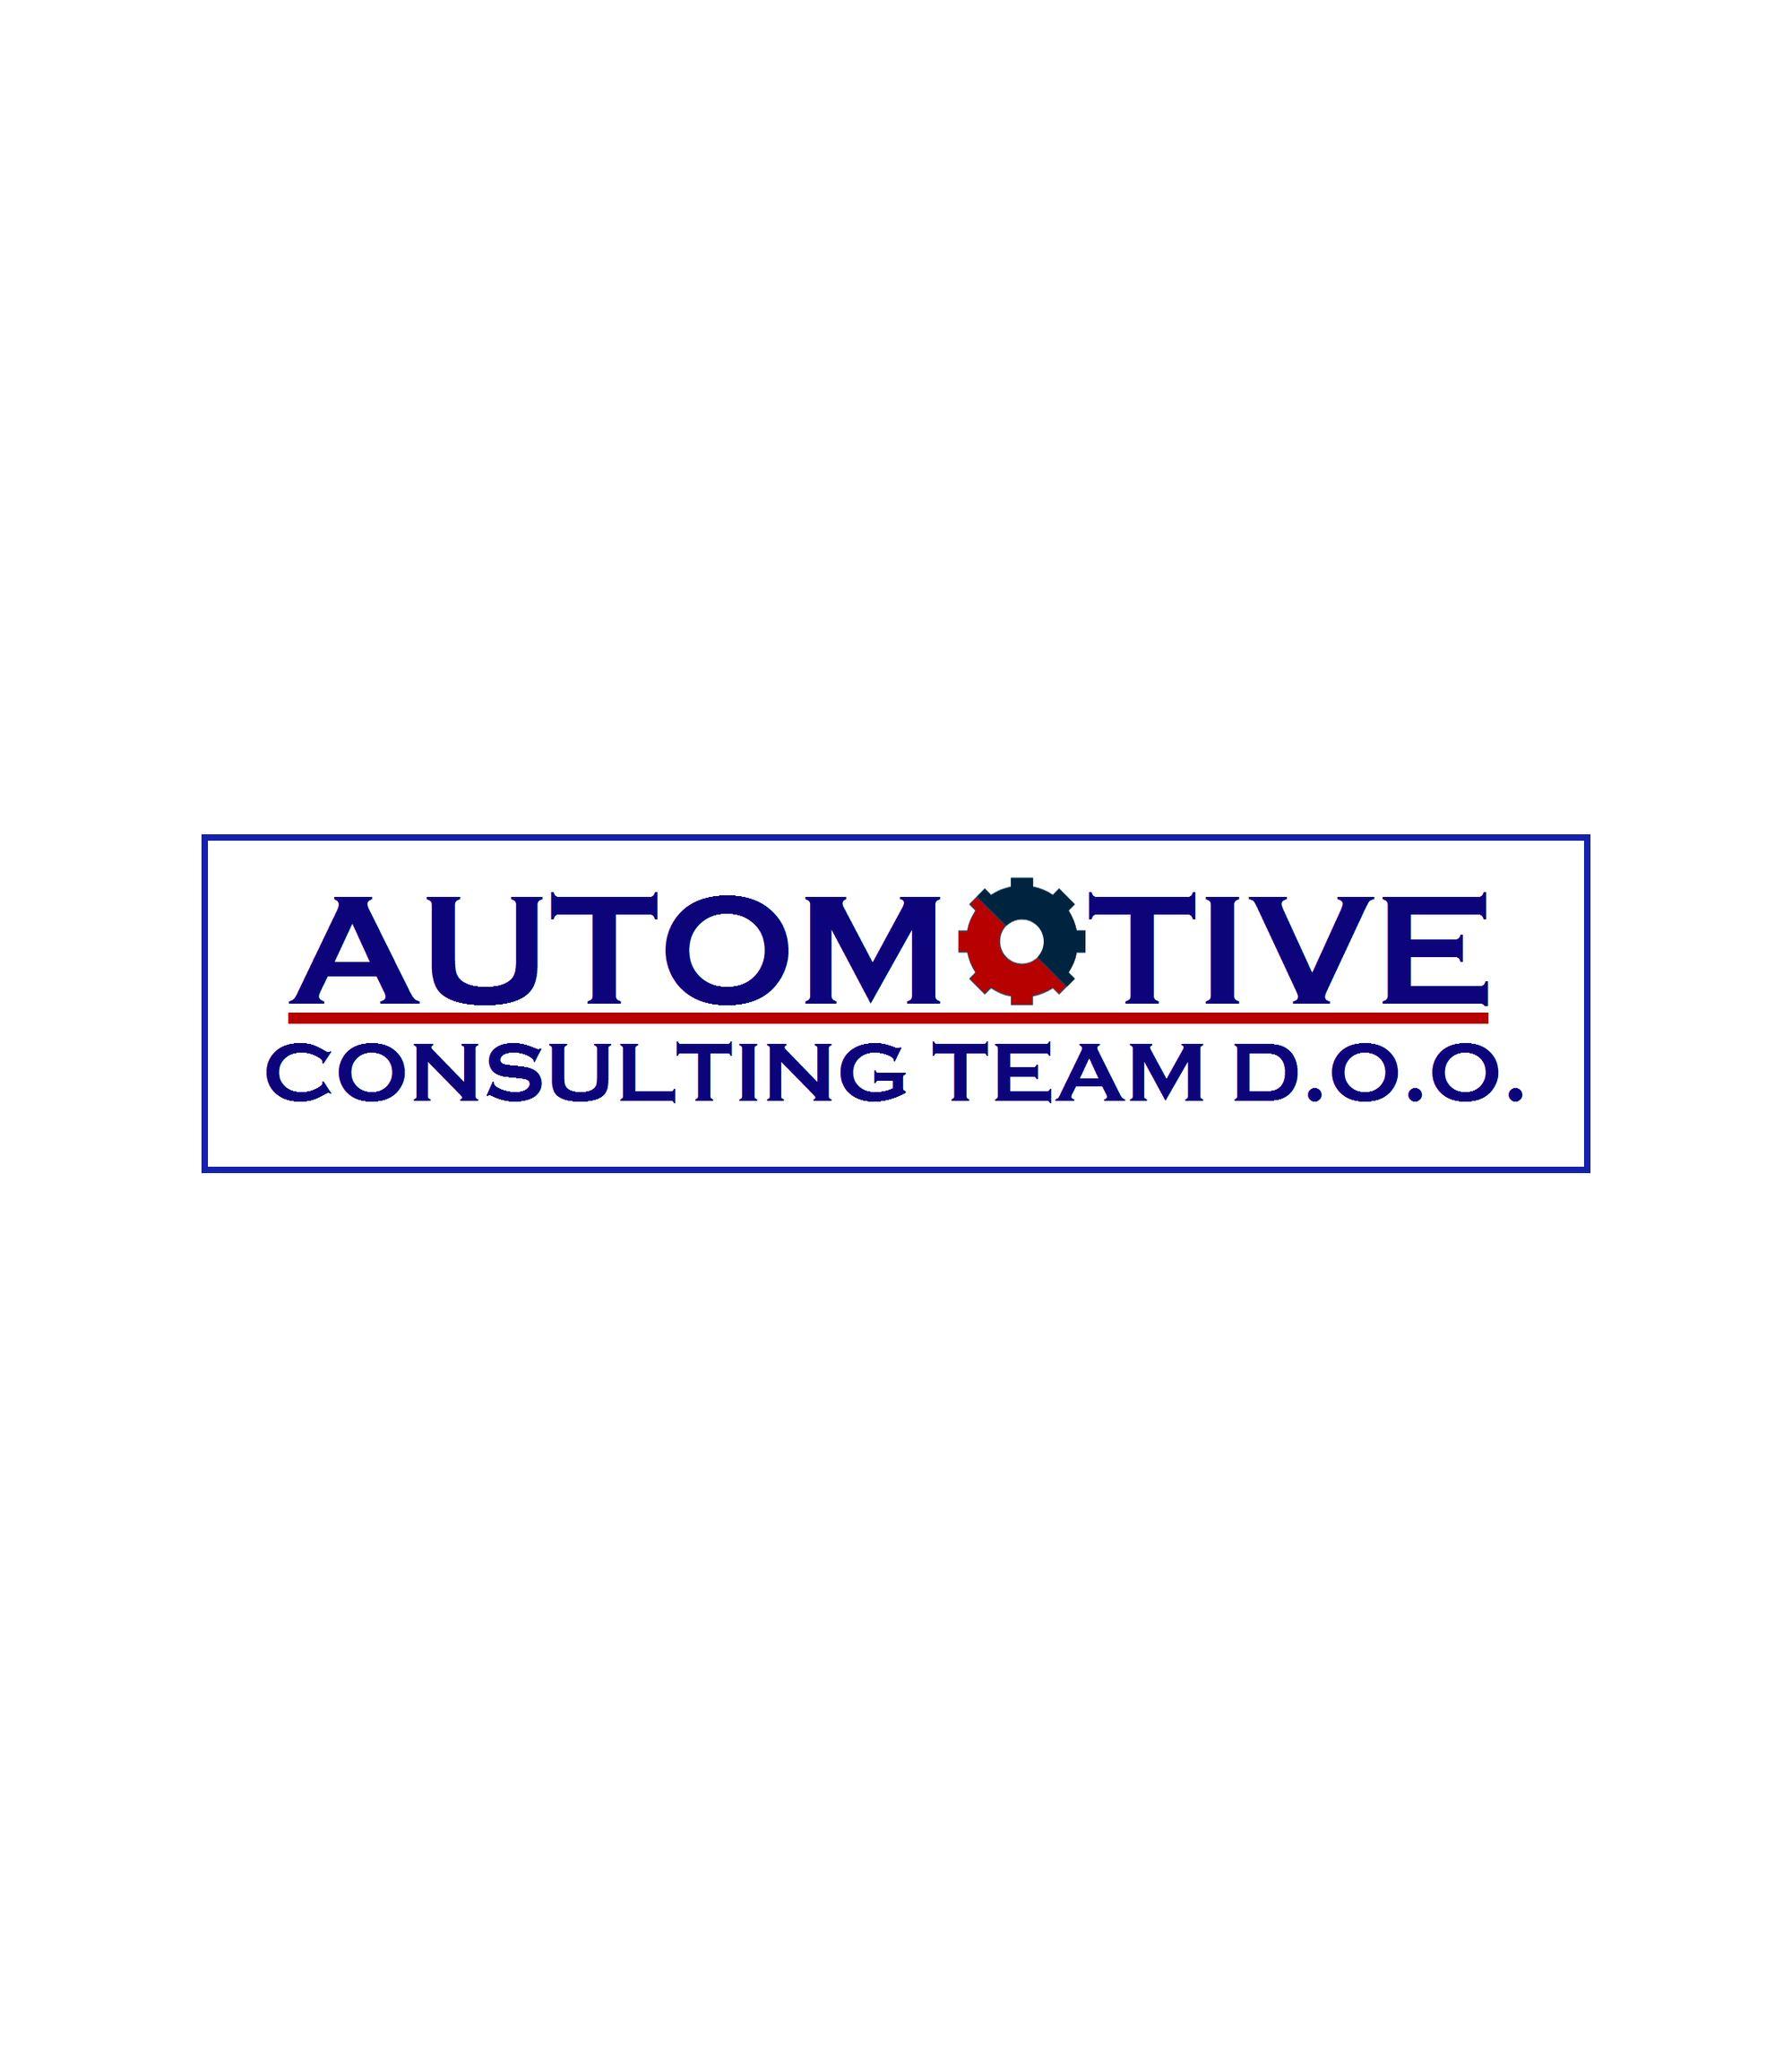 Automotive Consulting Team